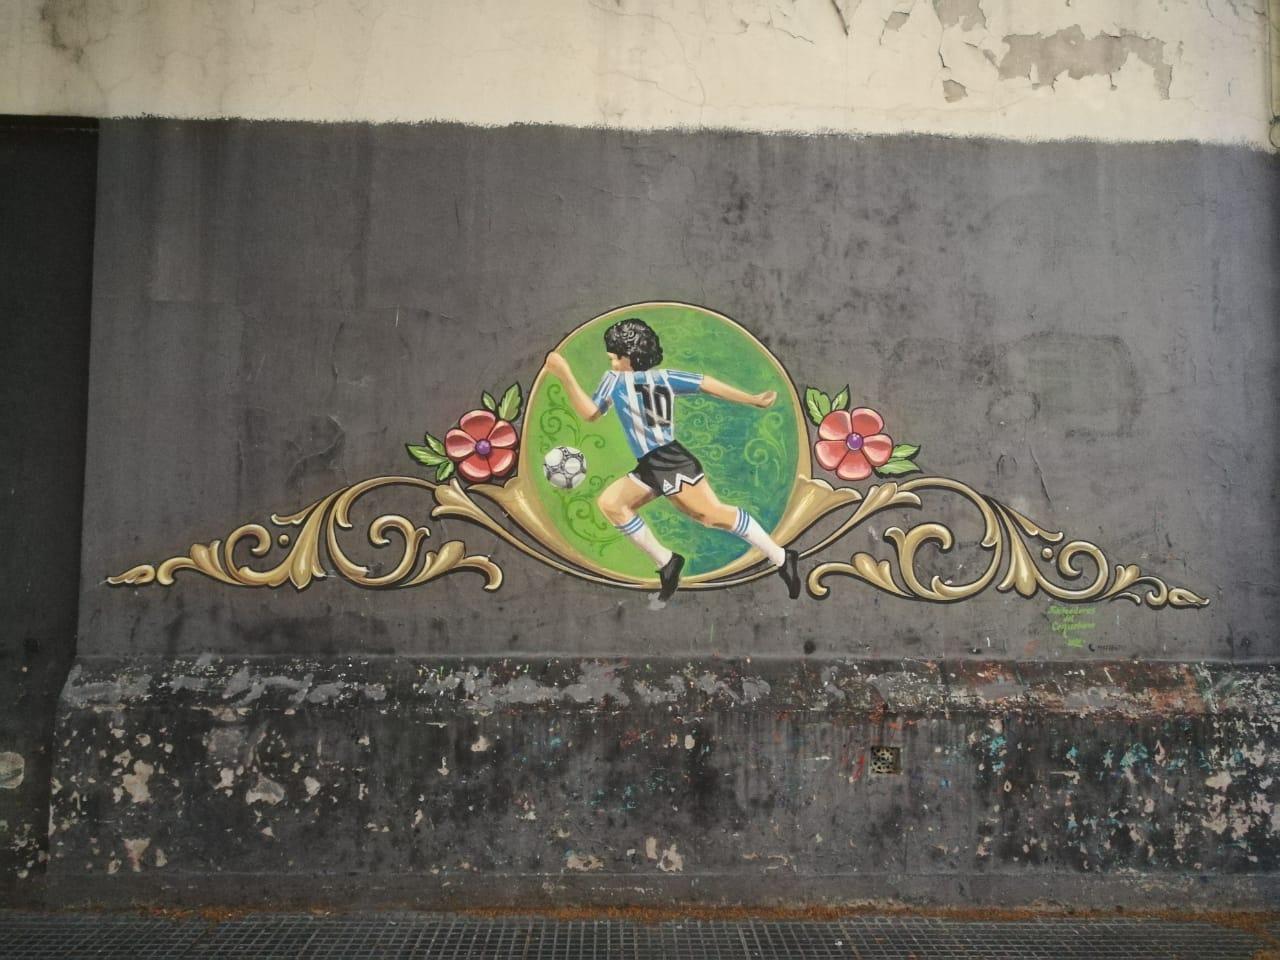 Adiós a Dios | Mural homenaje a Maradona en Monte Castro